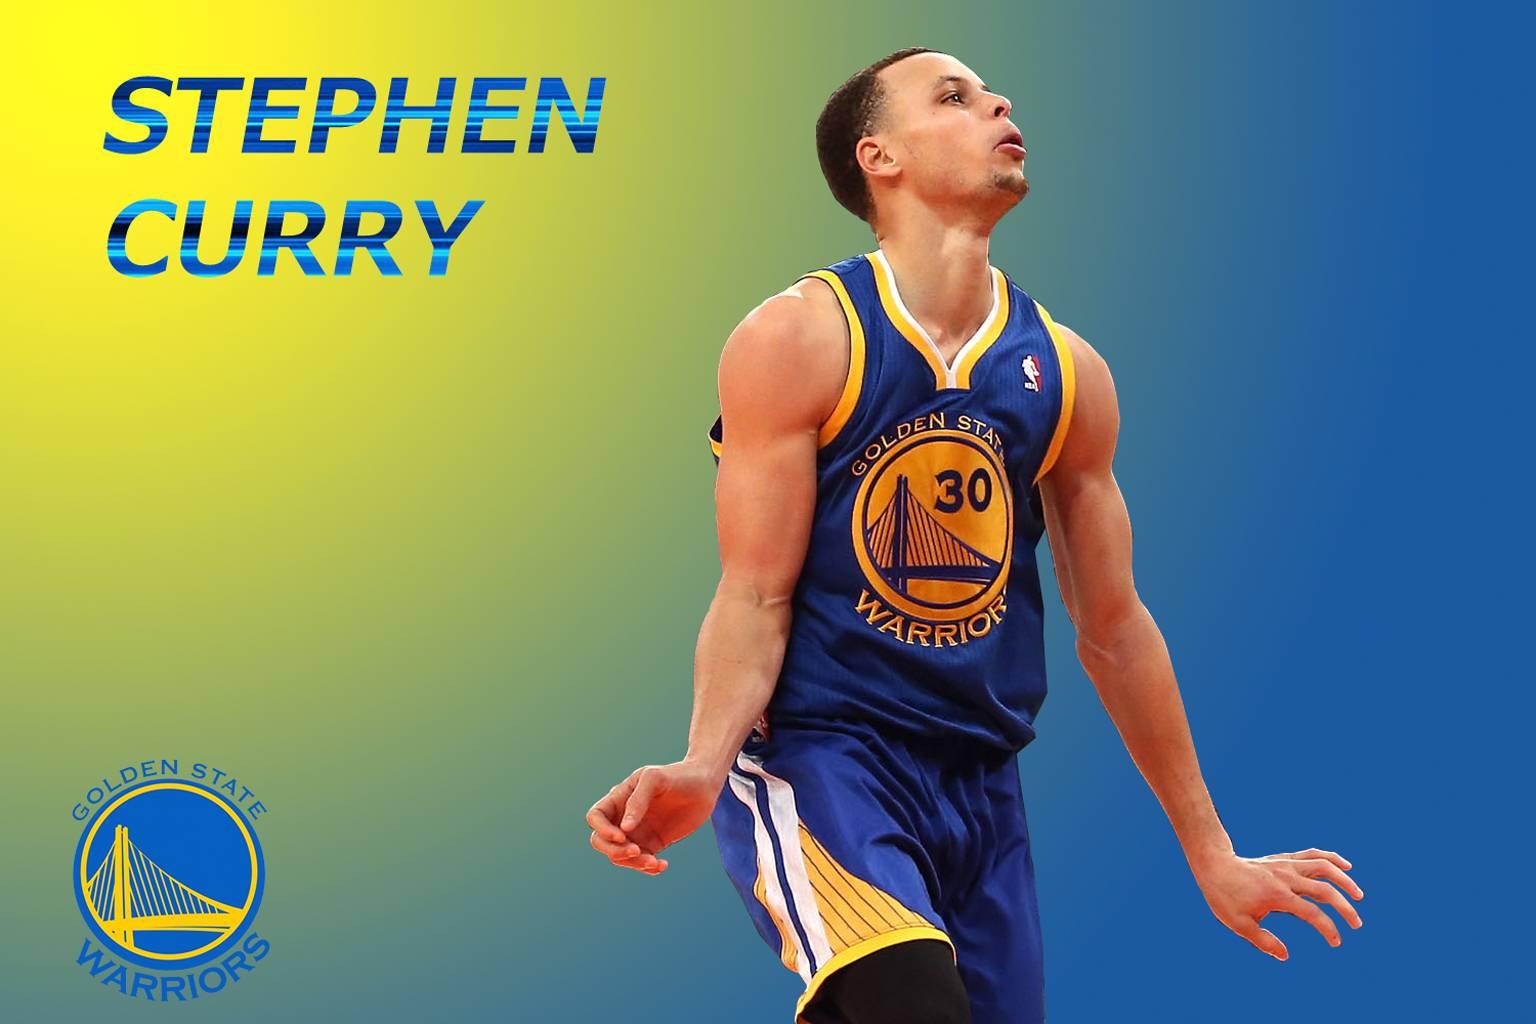 Stephen Curry winner